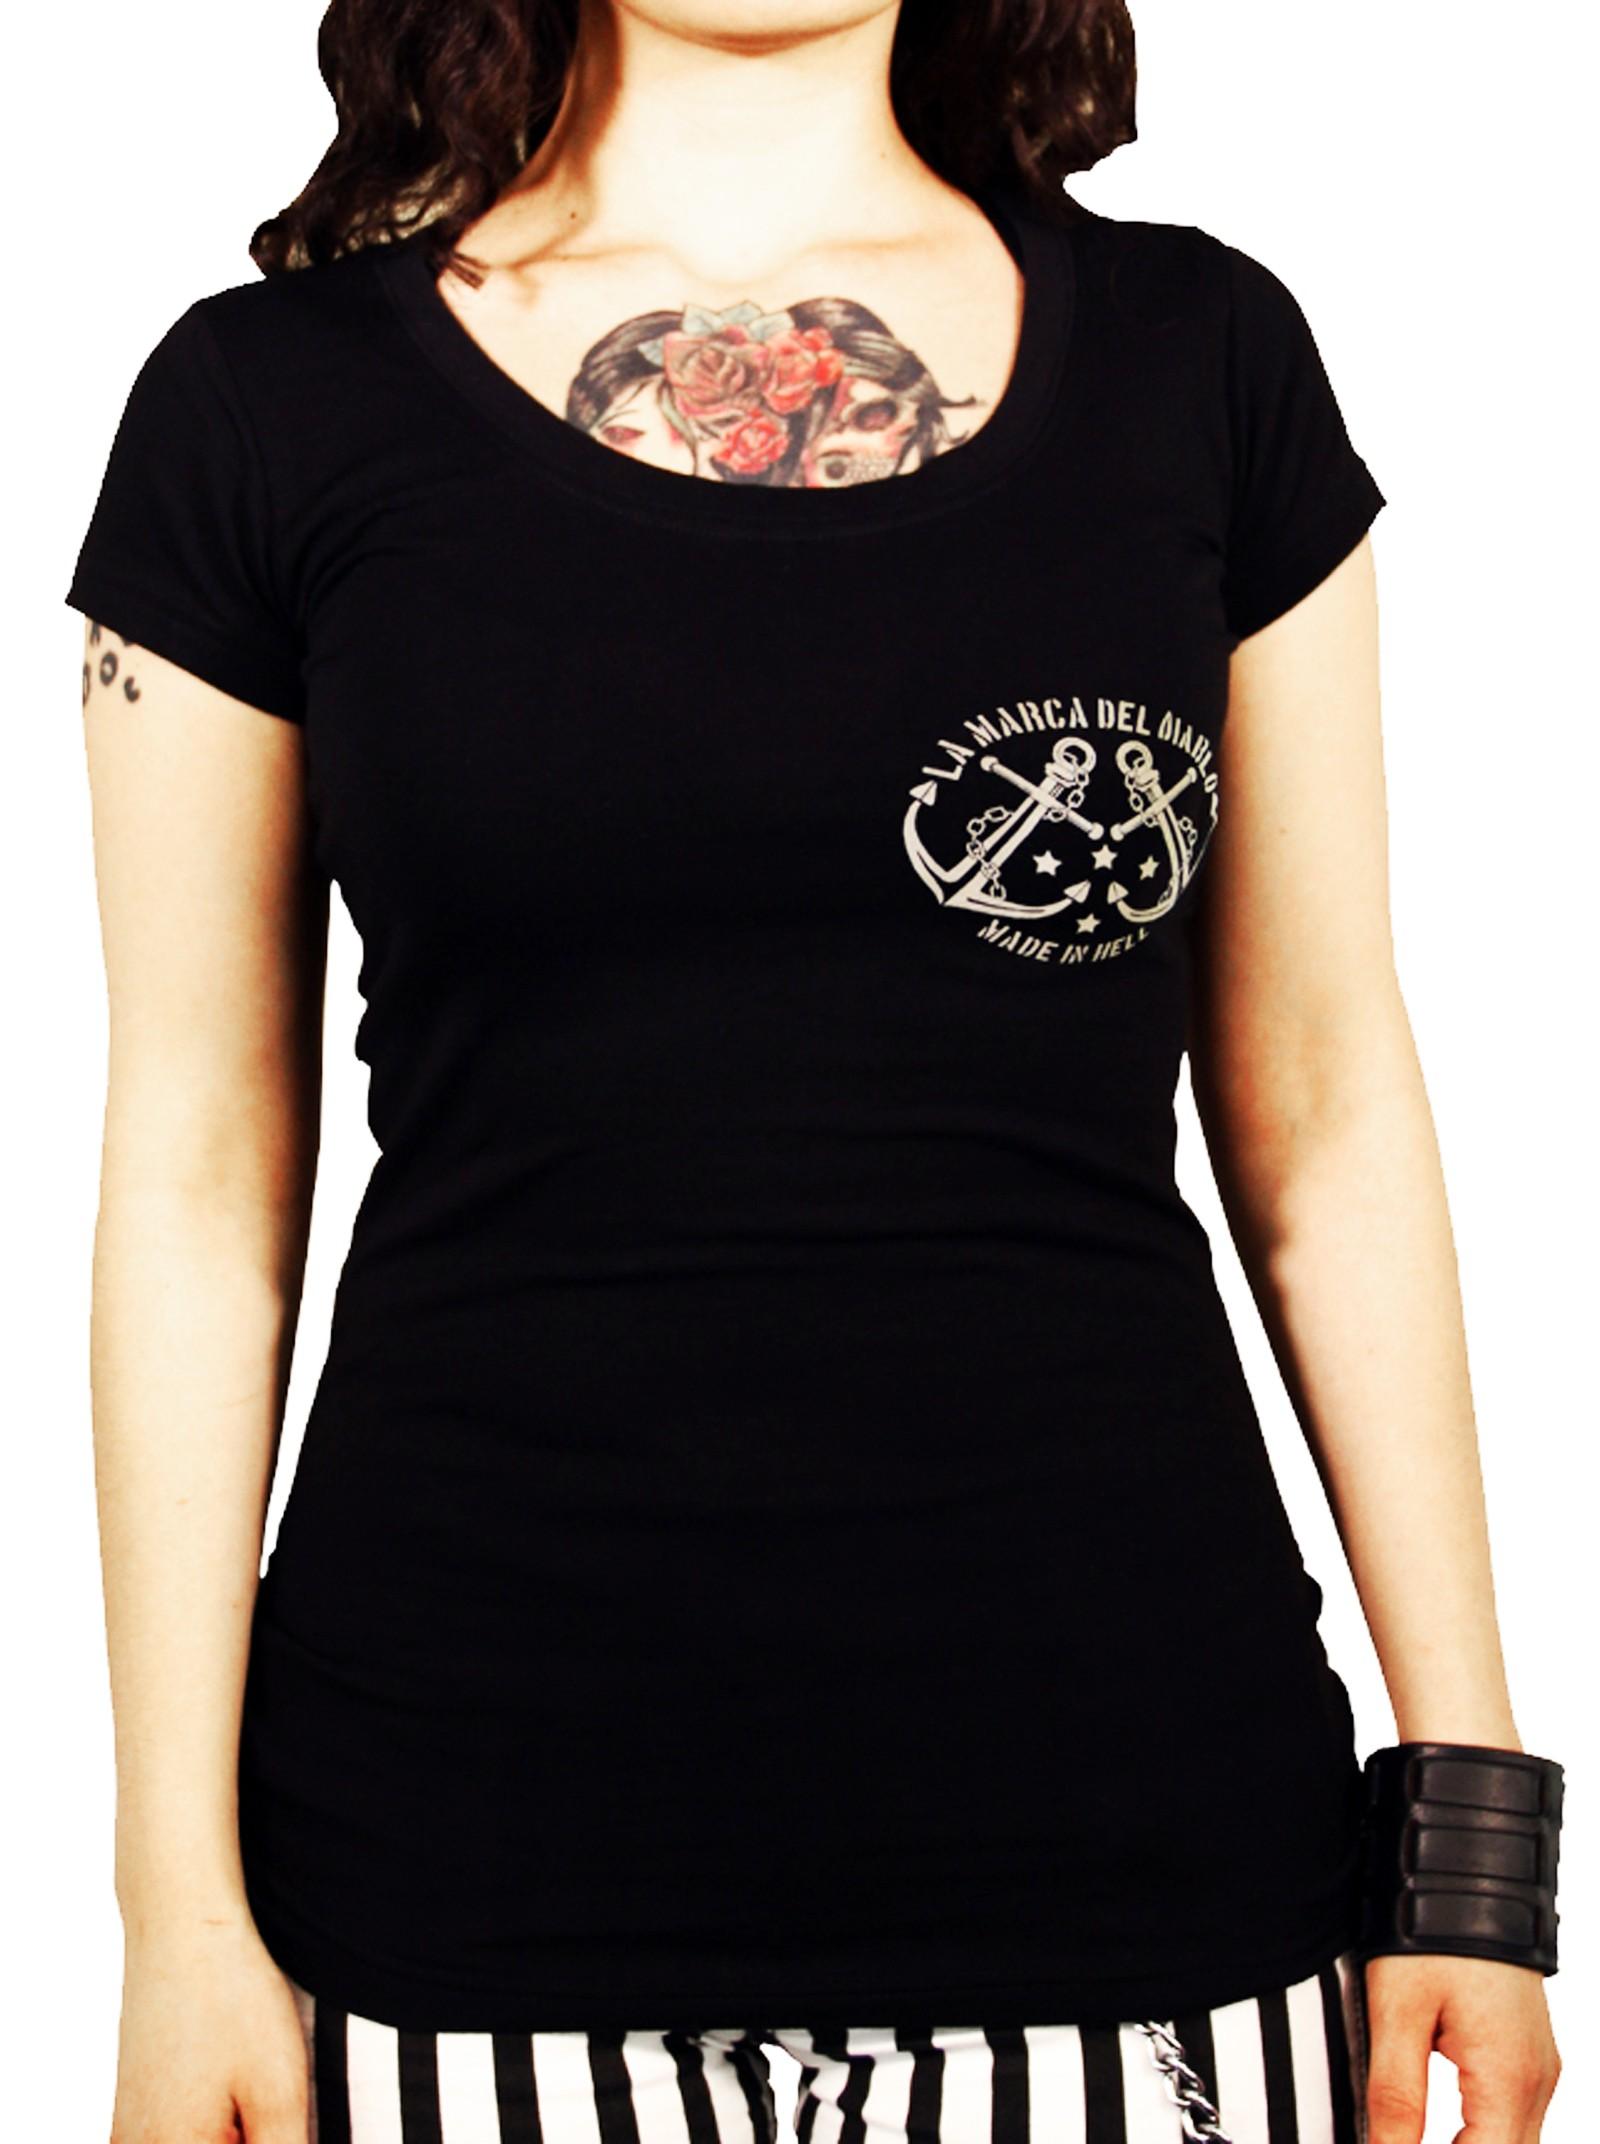 La Marca Del Diablo - Non Plus Ultra T-Shirt Front